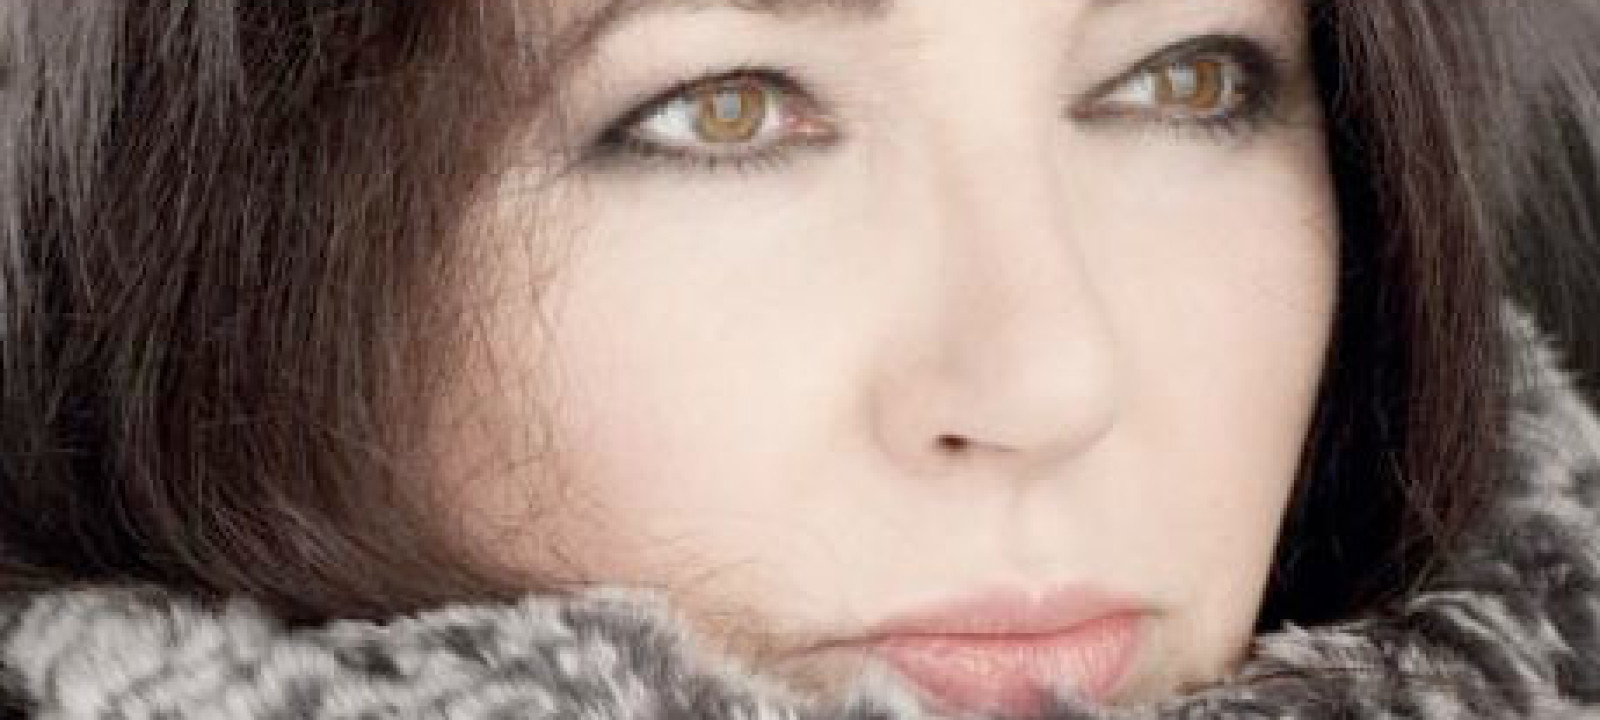 Kate Bush: Loyal To The Kick Inside